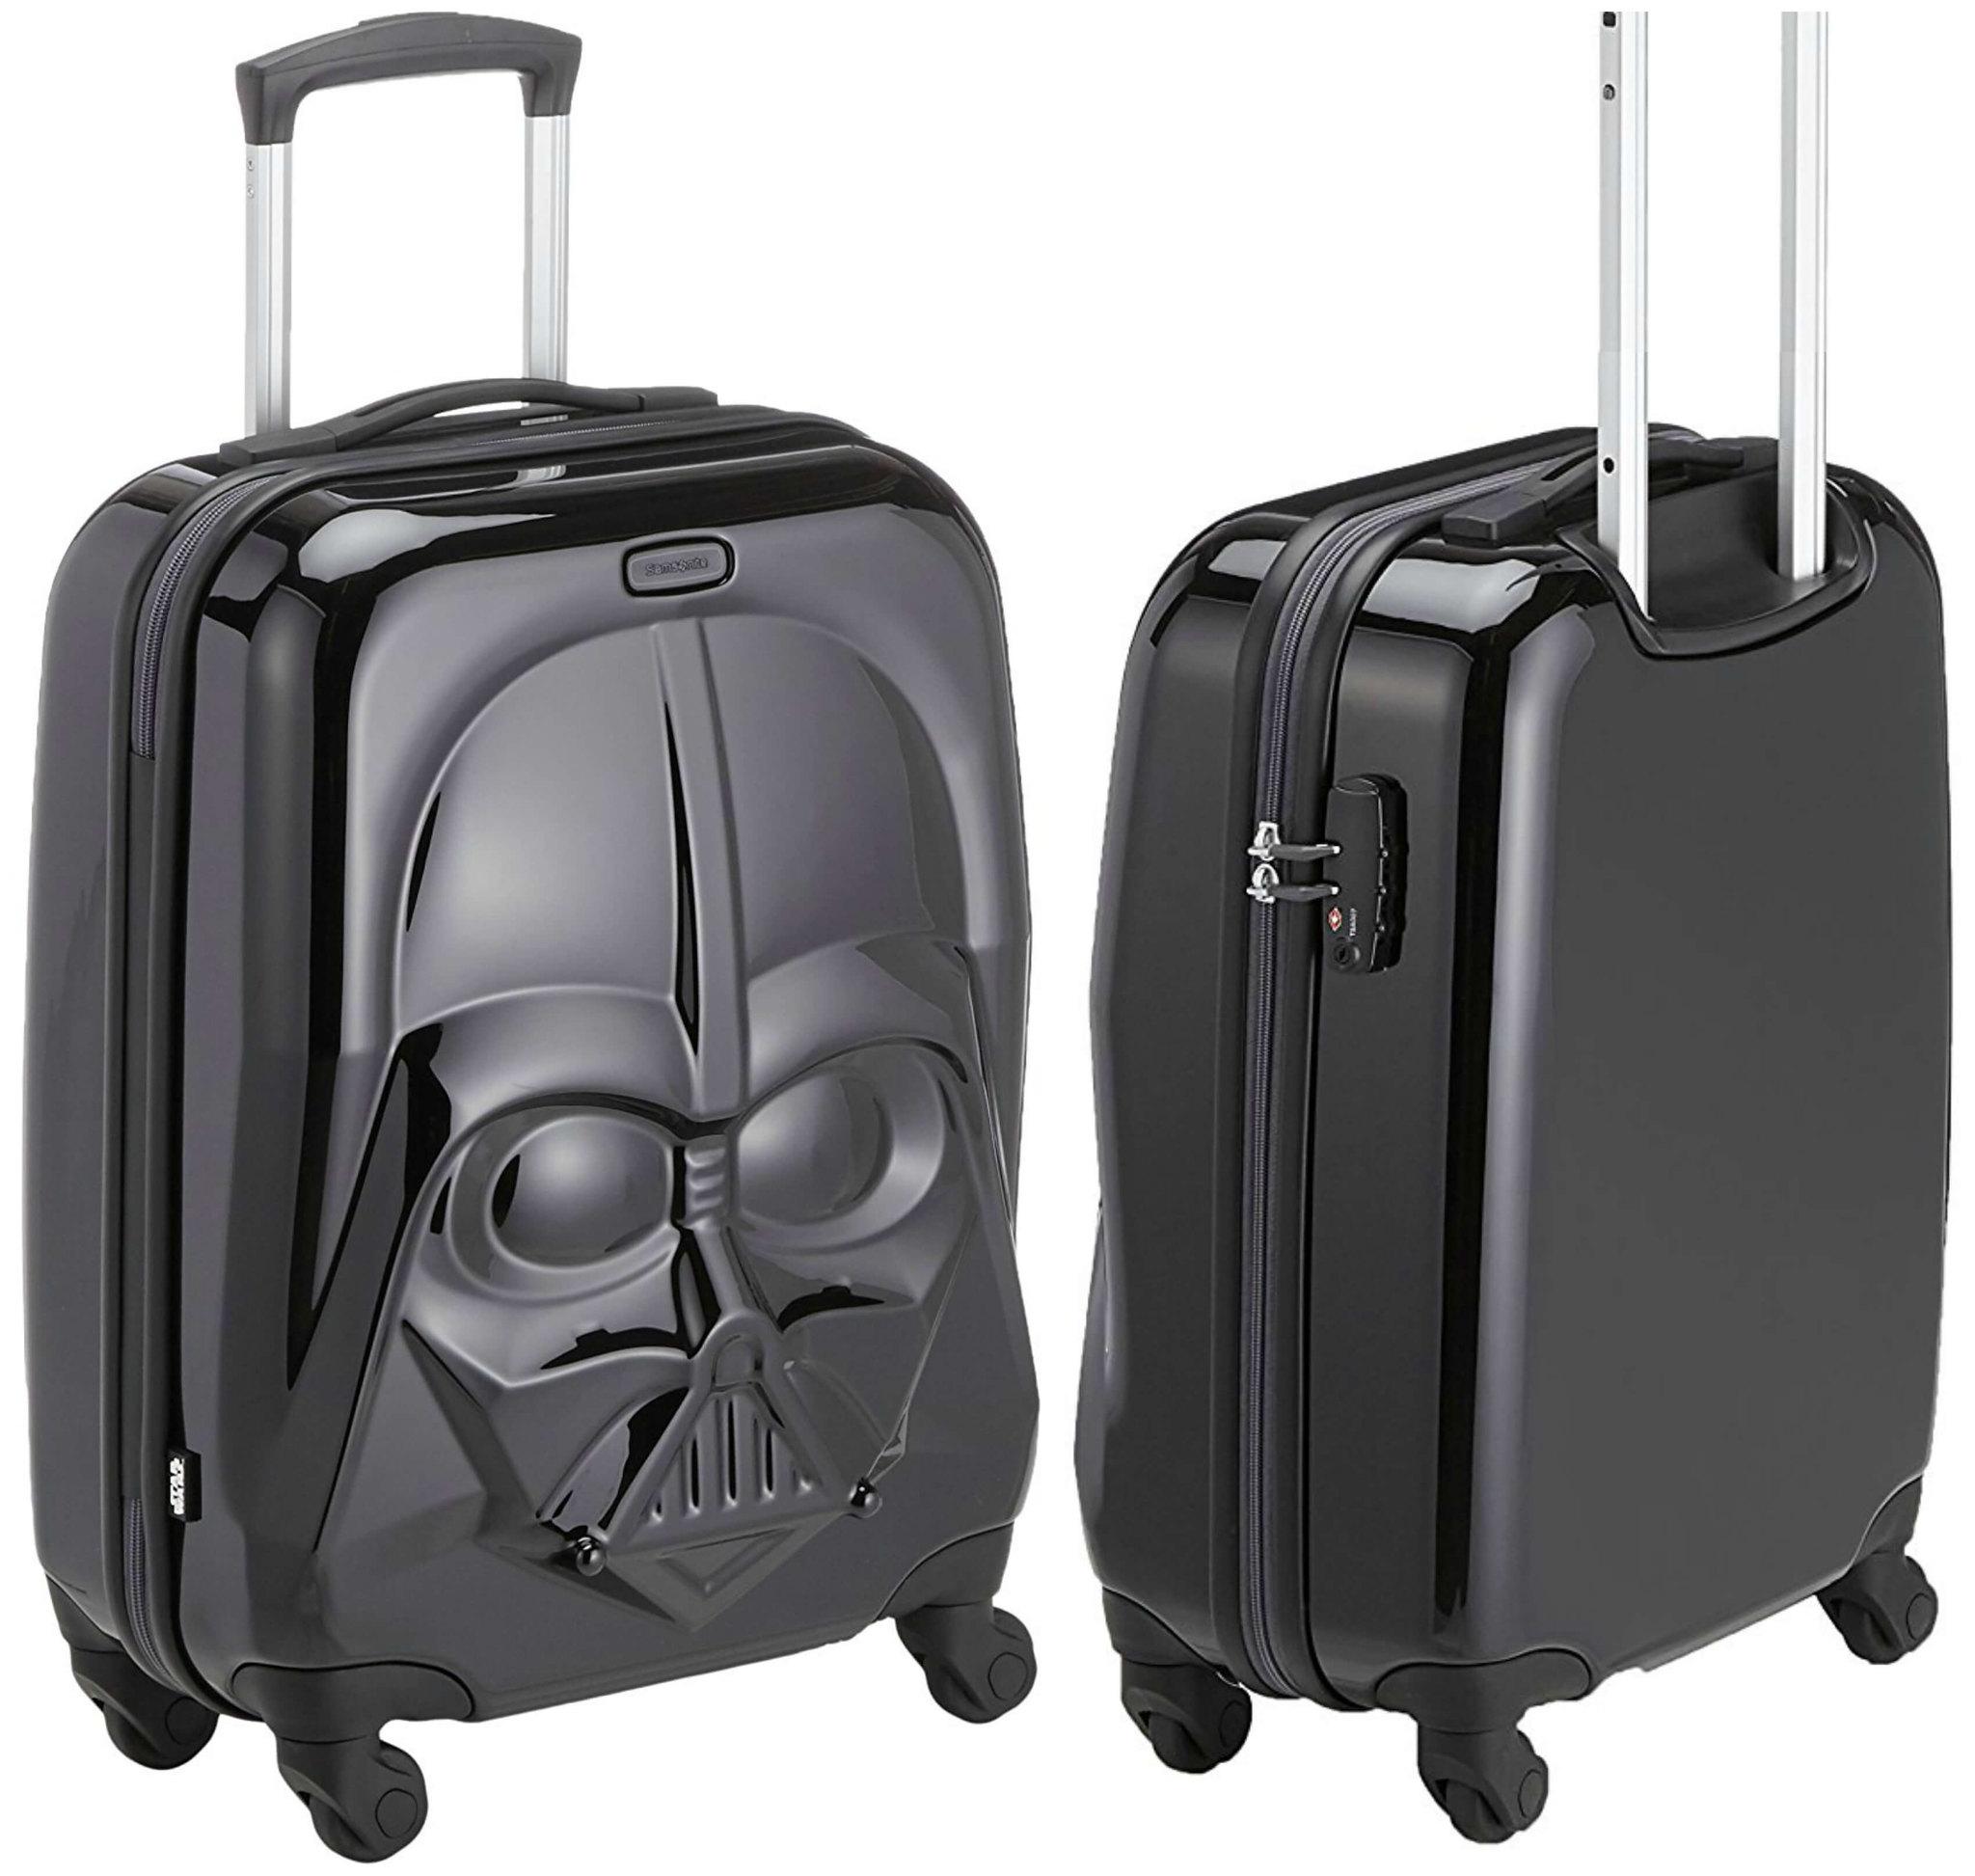 maletas disney recomendadas para comprar